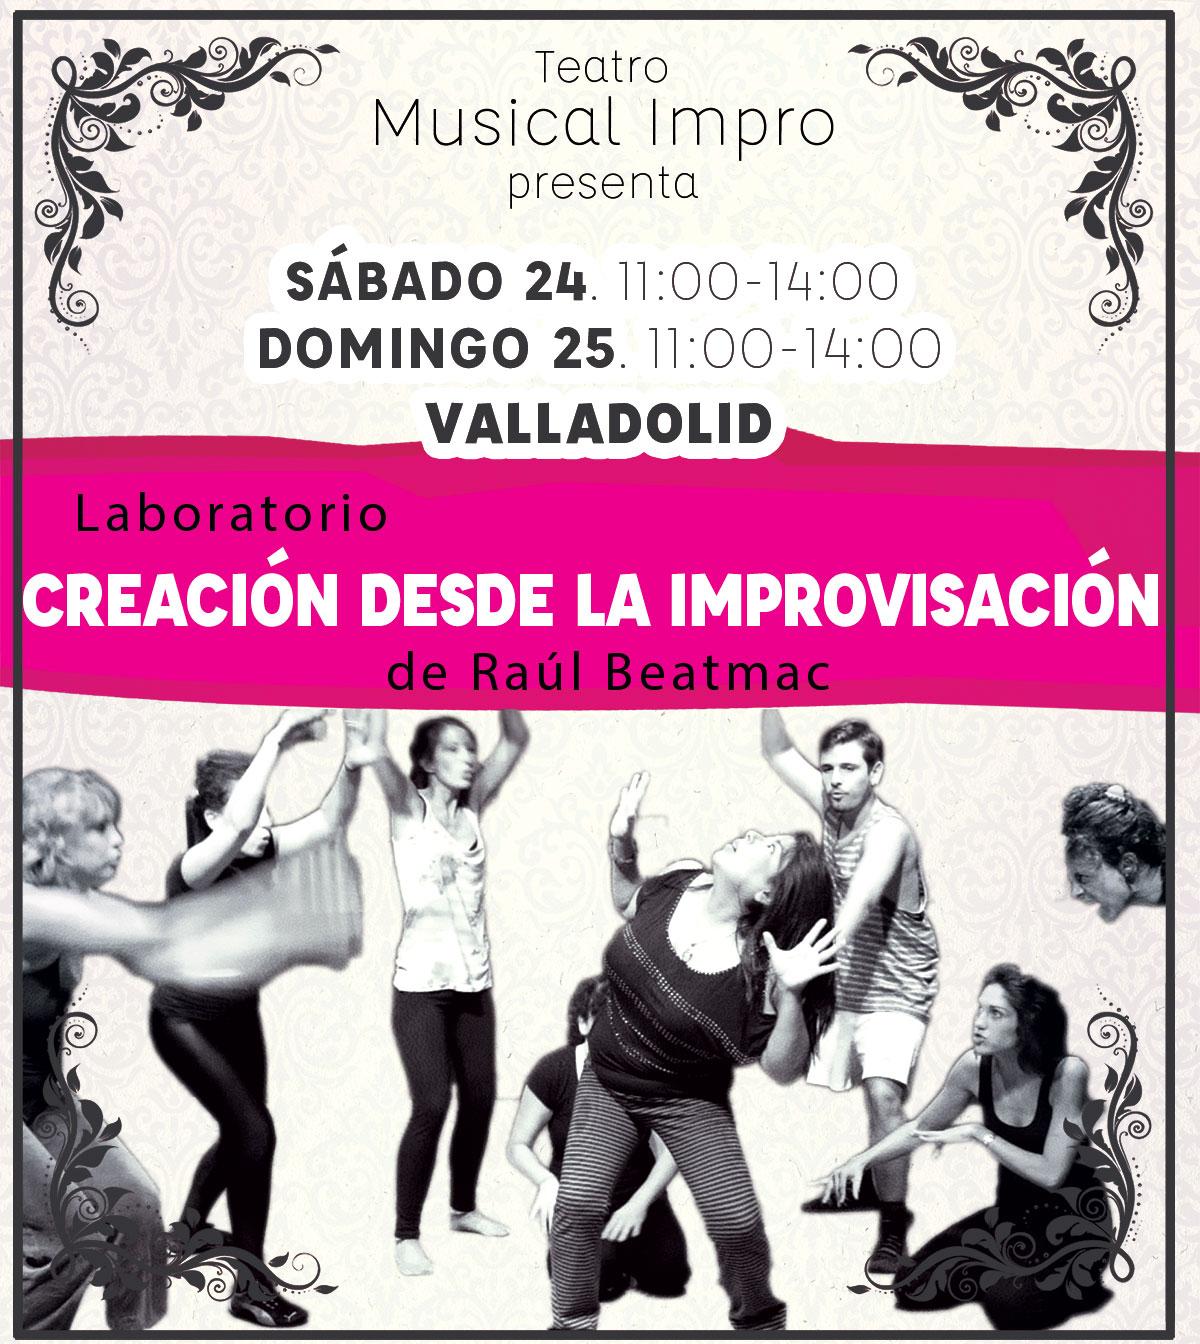 Impro Valladolid